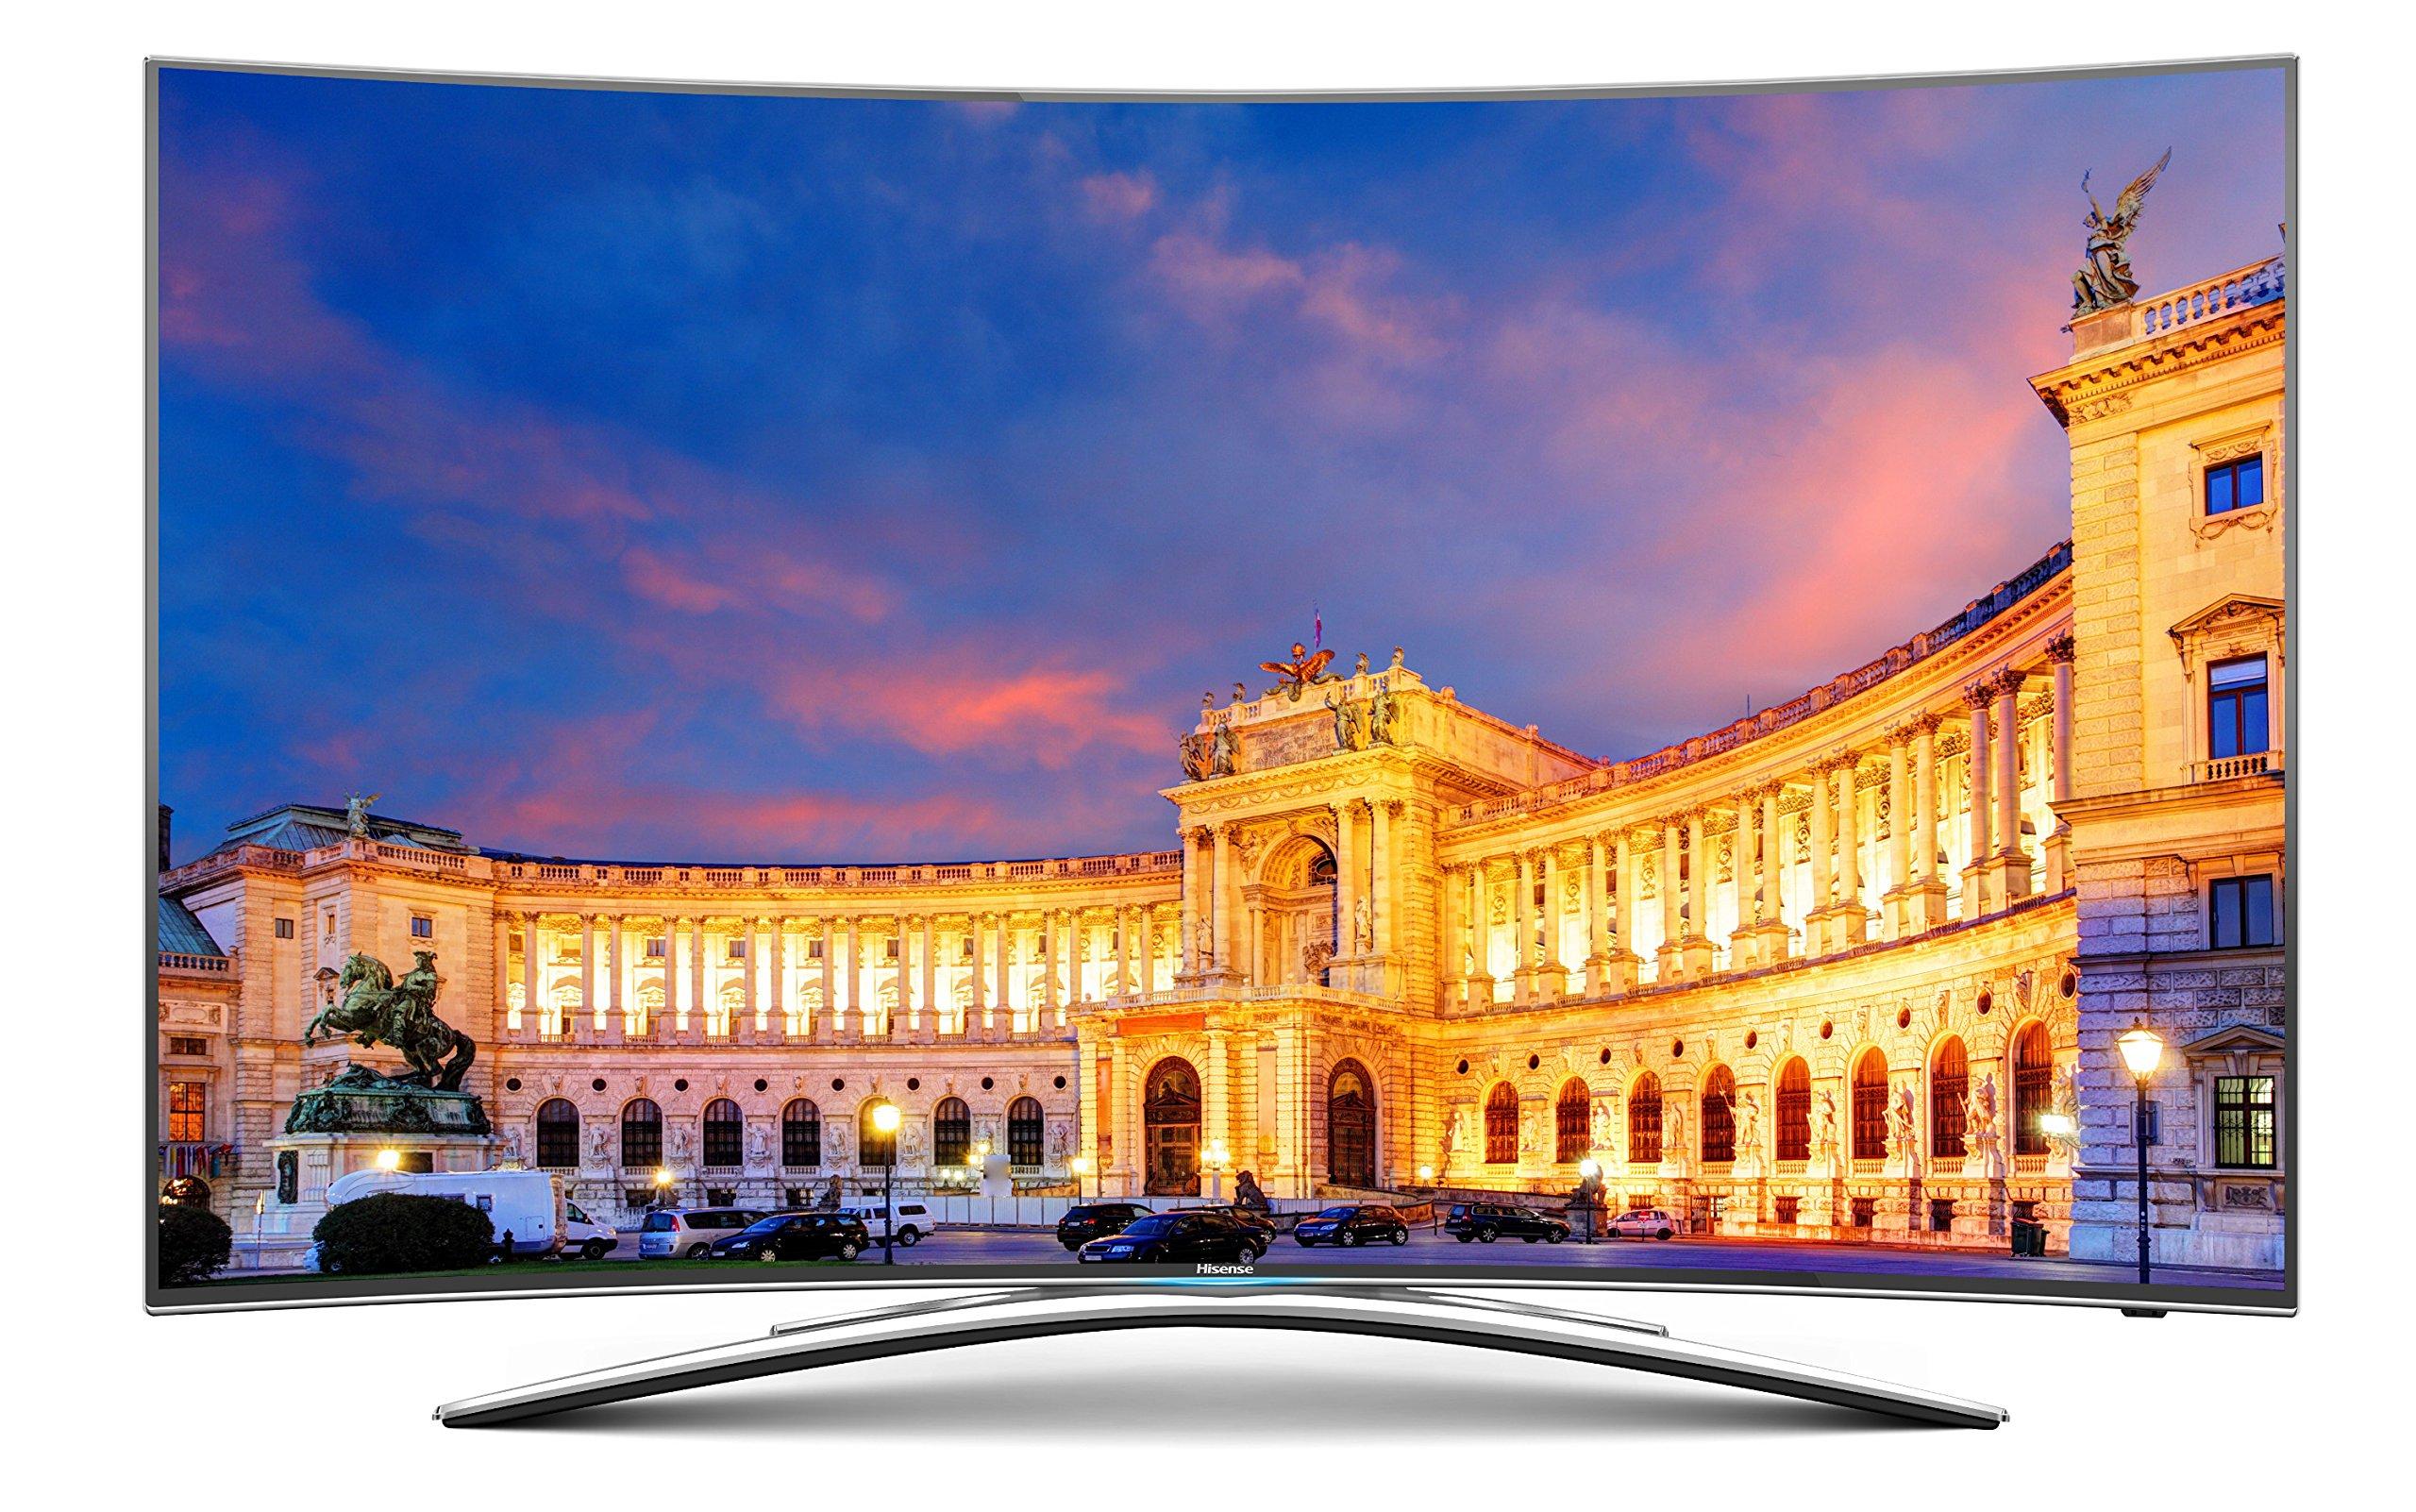 Hisense UB55EC870 - Televisor 138 cm/55 pulgadas, Ultra HD, sintonizador triple, Smart TV: Amazon.es: Hisense: Libros